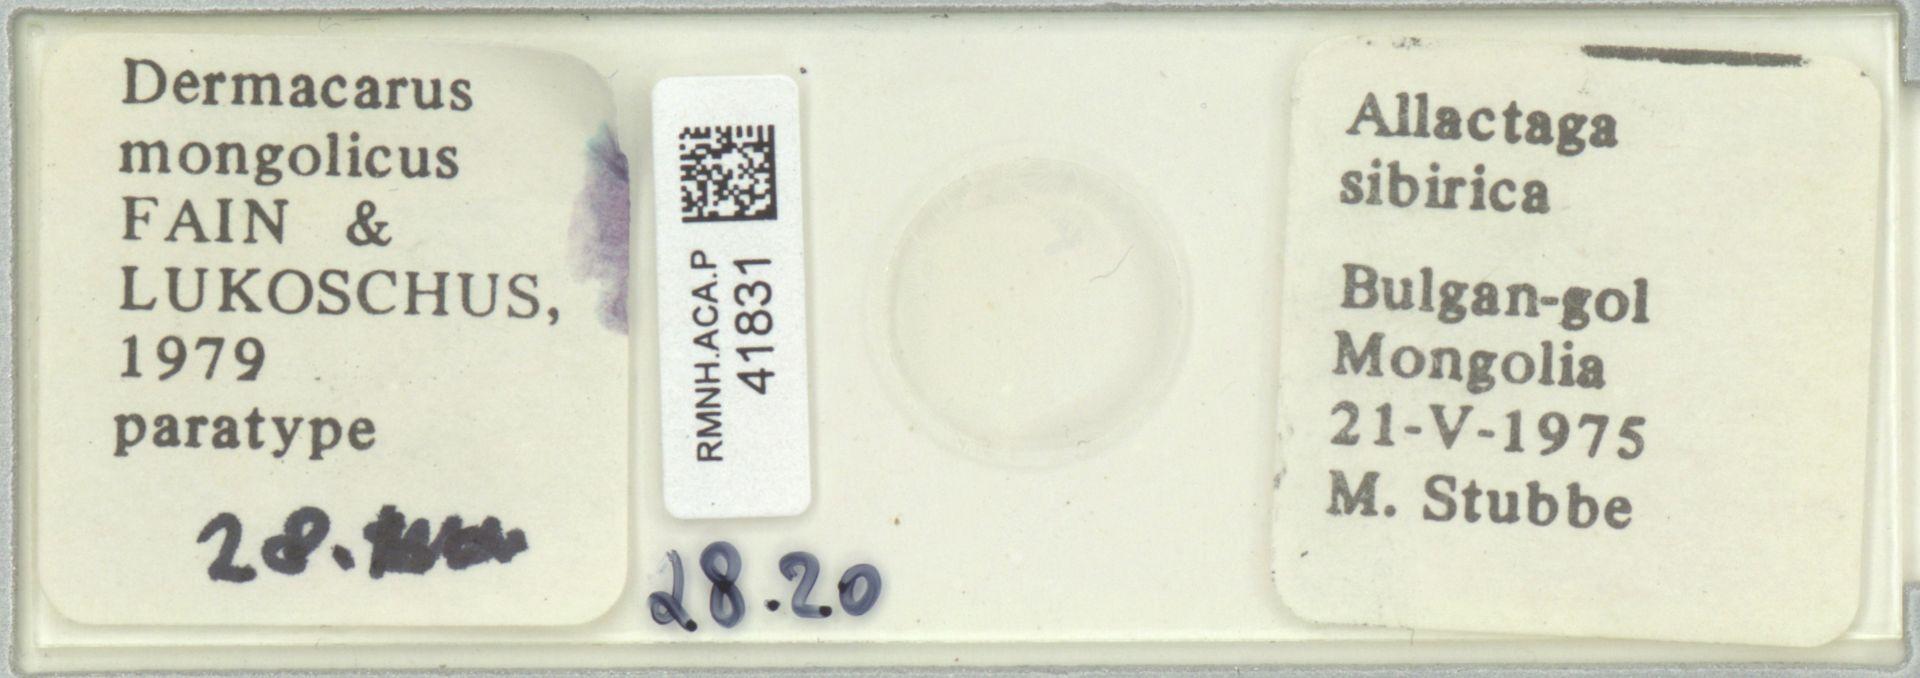 RMNH.ACA.P.41831   Dermacarus mongolicus Fain & Lukoschus, 1979